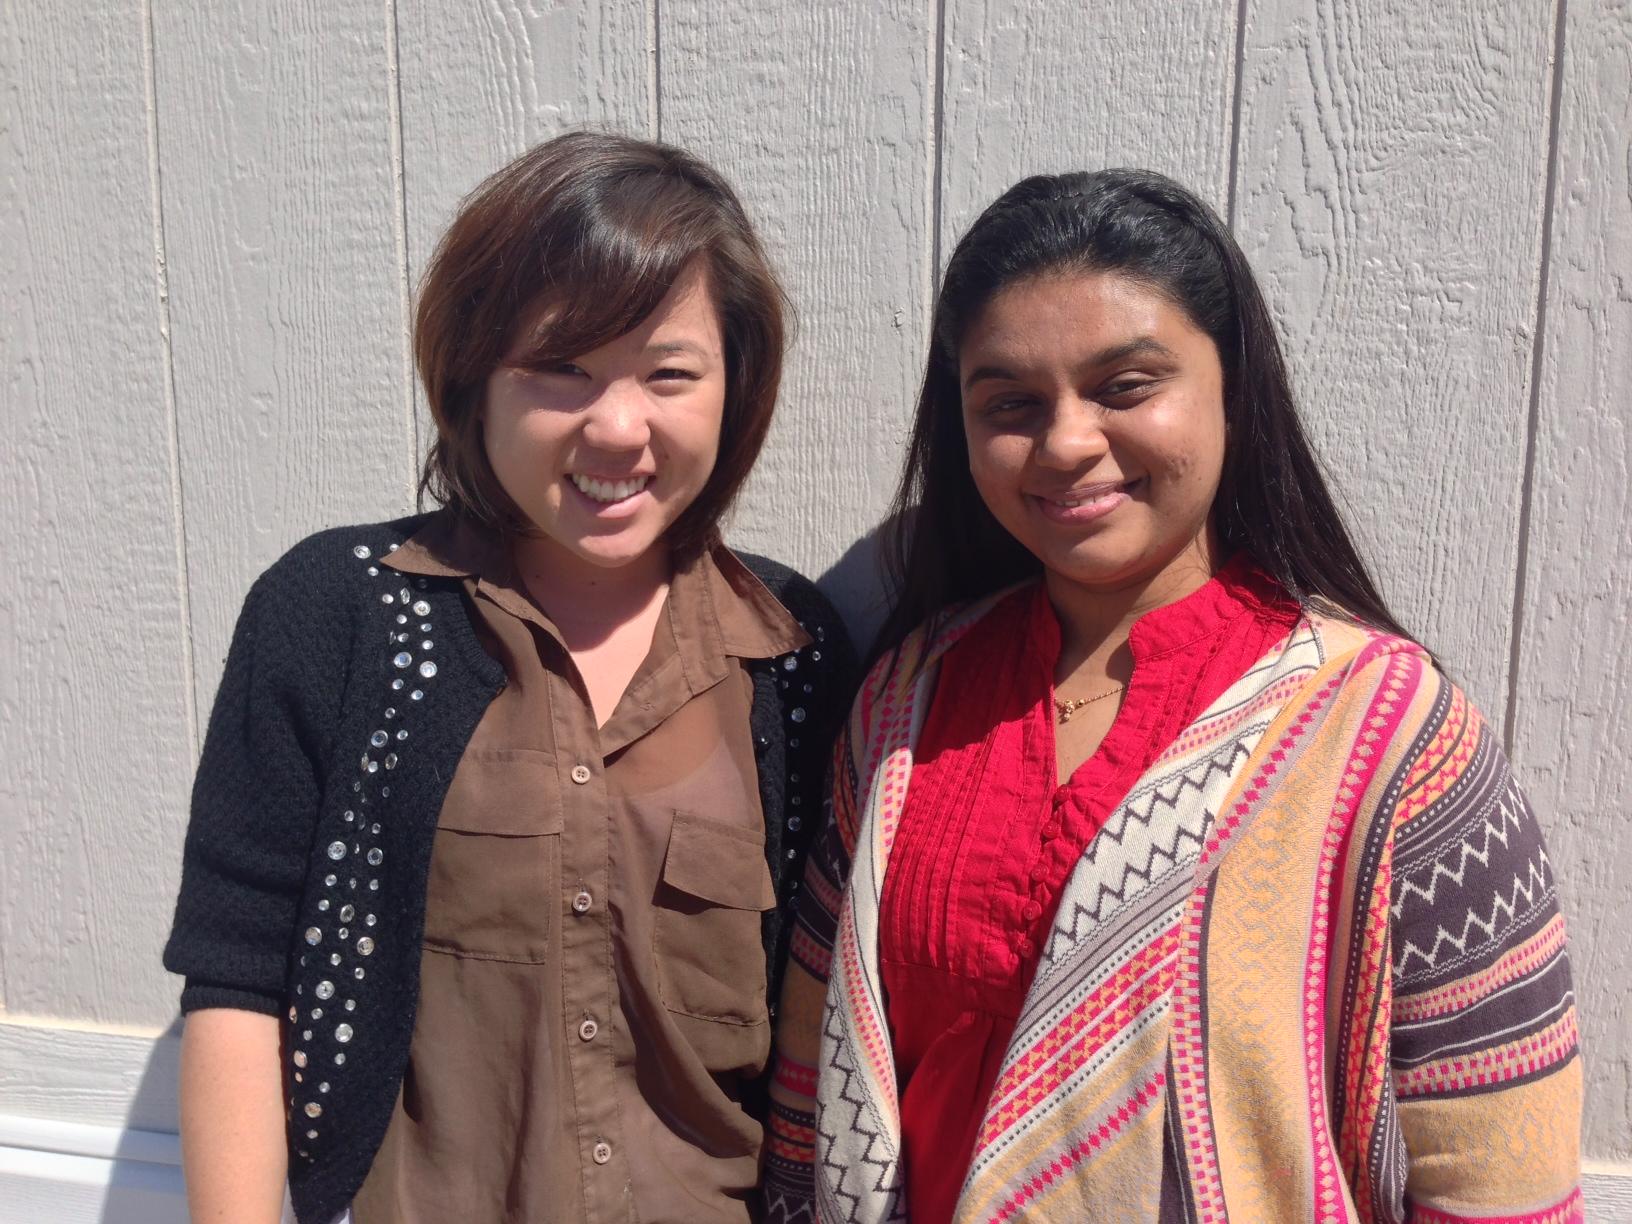 Lisa (left) and Shailja (right) smile outside of the IT trailer.